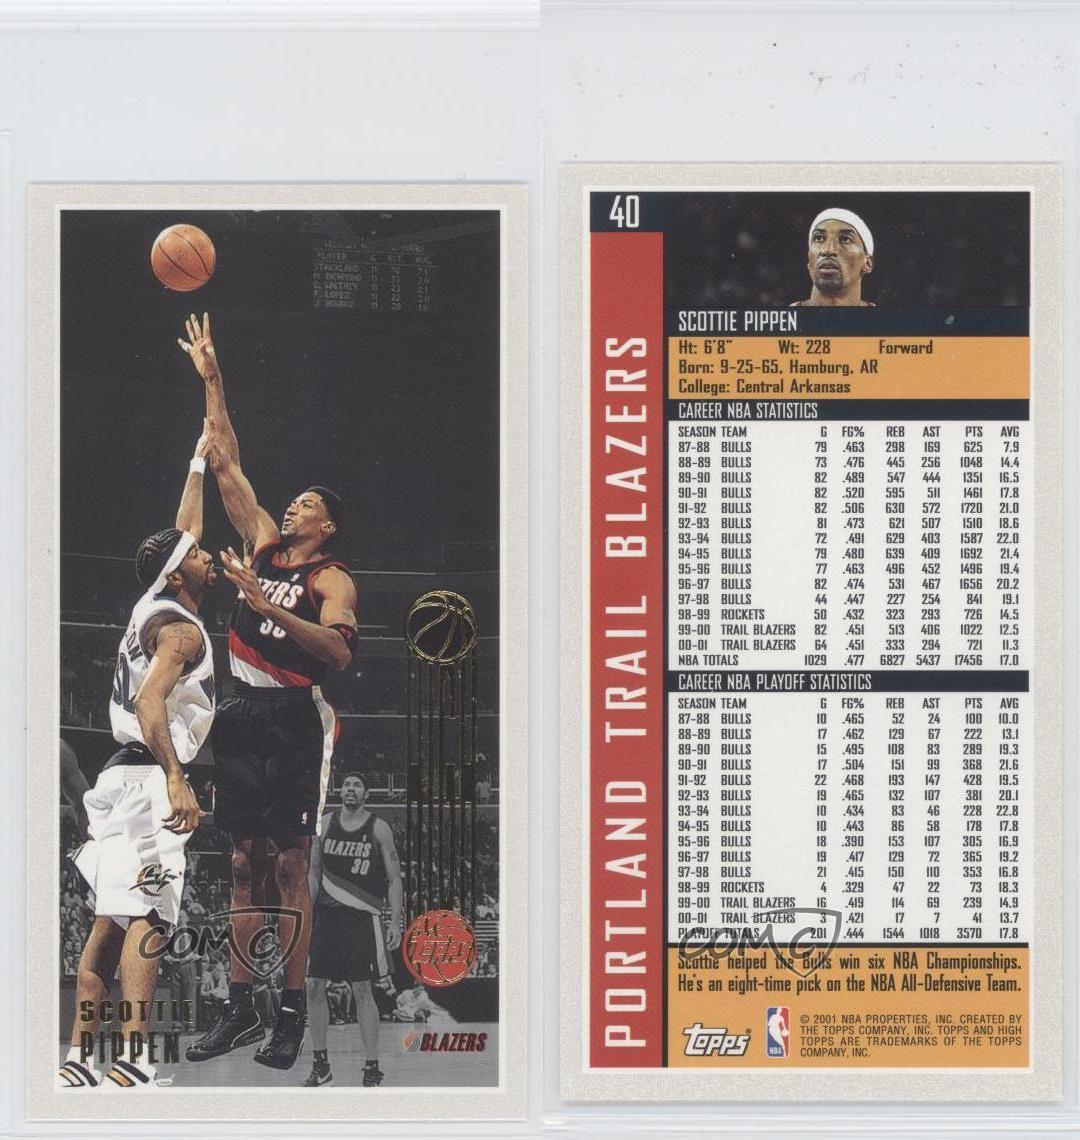 Portland Trail Blazers Roster 1992: 2001-02 Topps High #40 Scottie Pippen Portland Trail